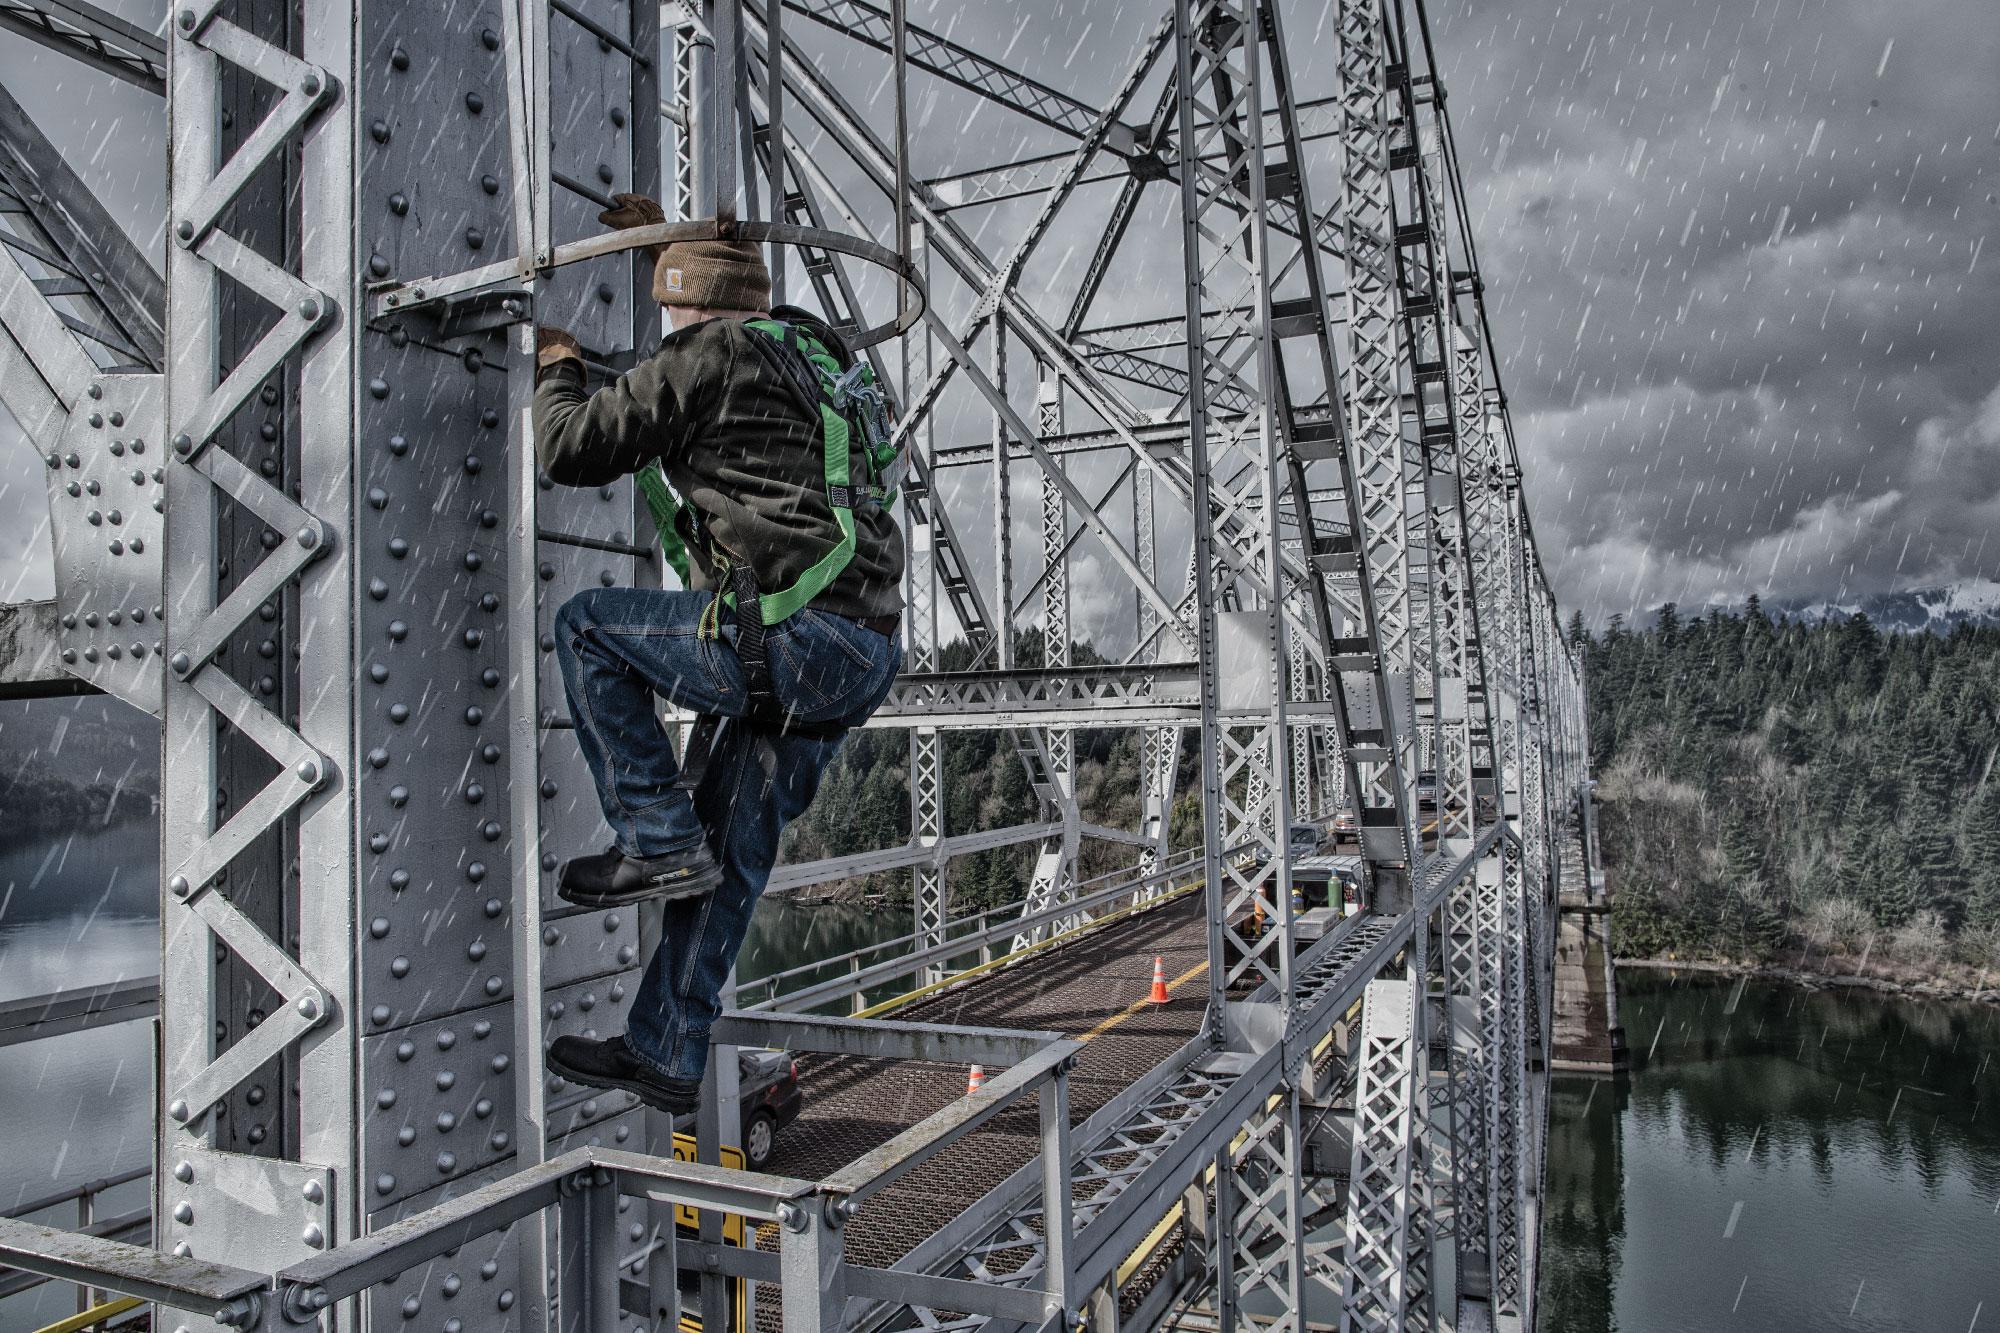 Bridge_Of_The_Gods_0022-BASE_BP.jpg